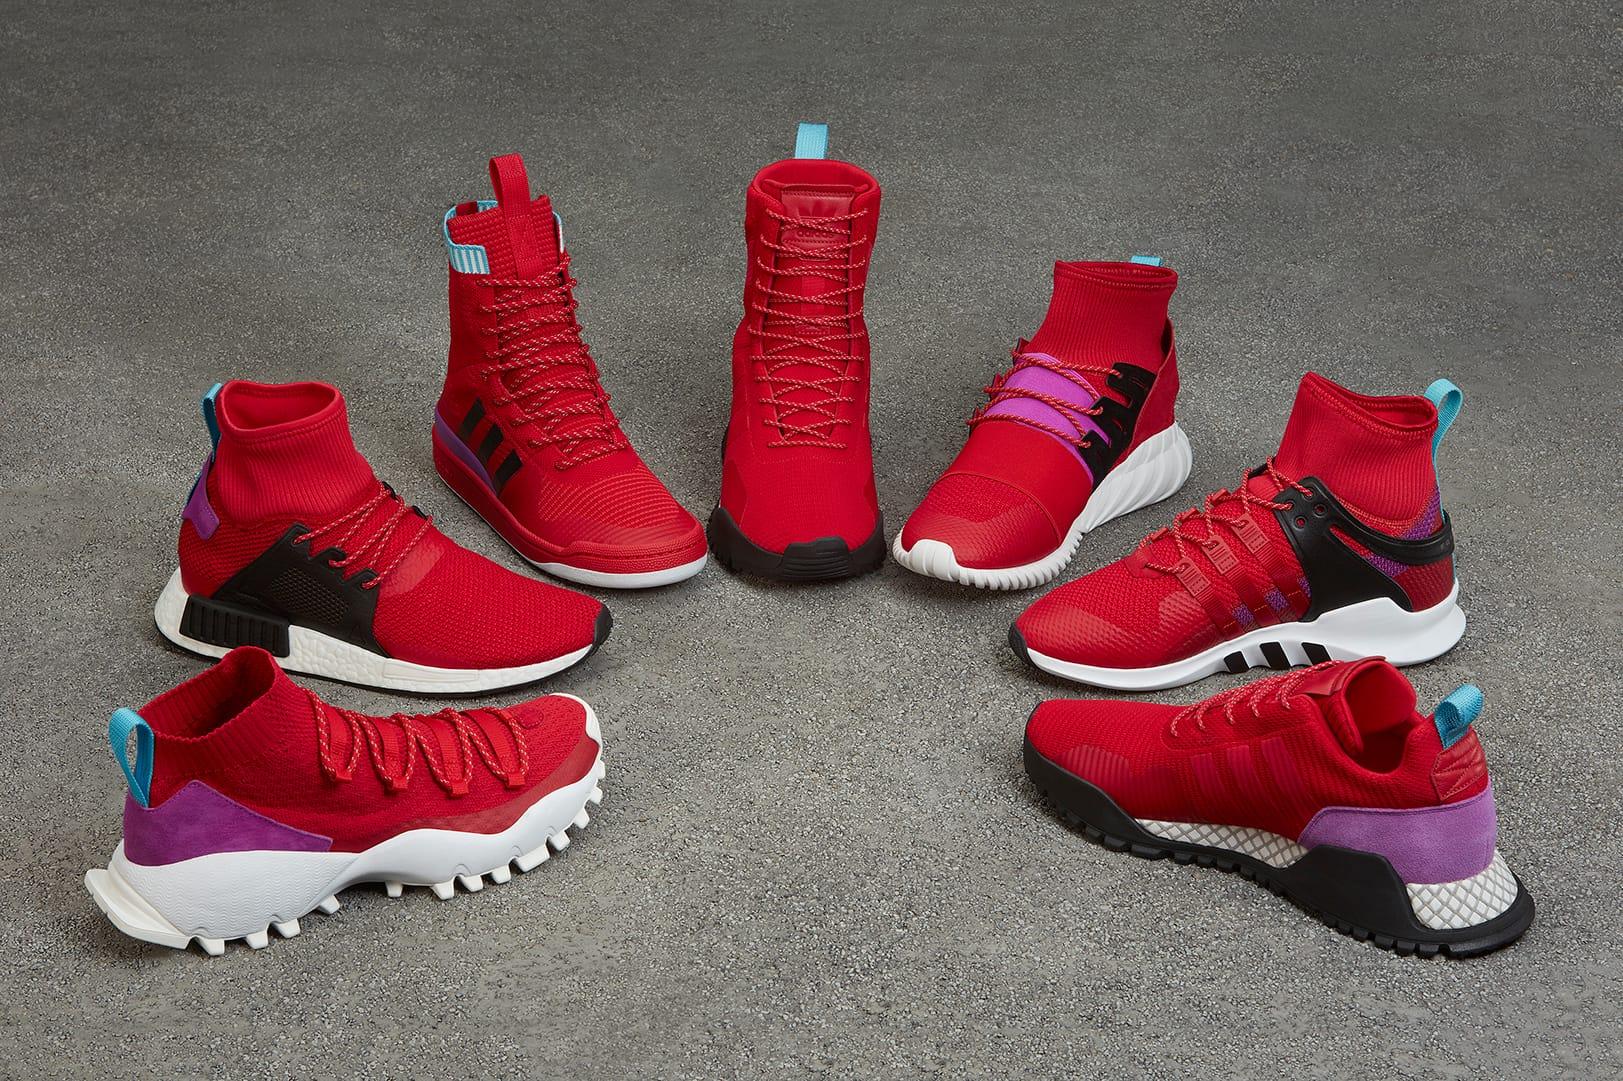 adidas Originals Winter 2017 Footwear